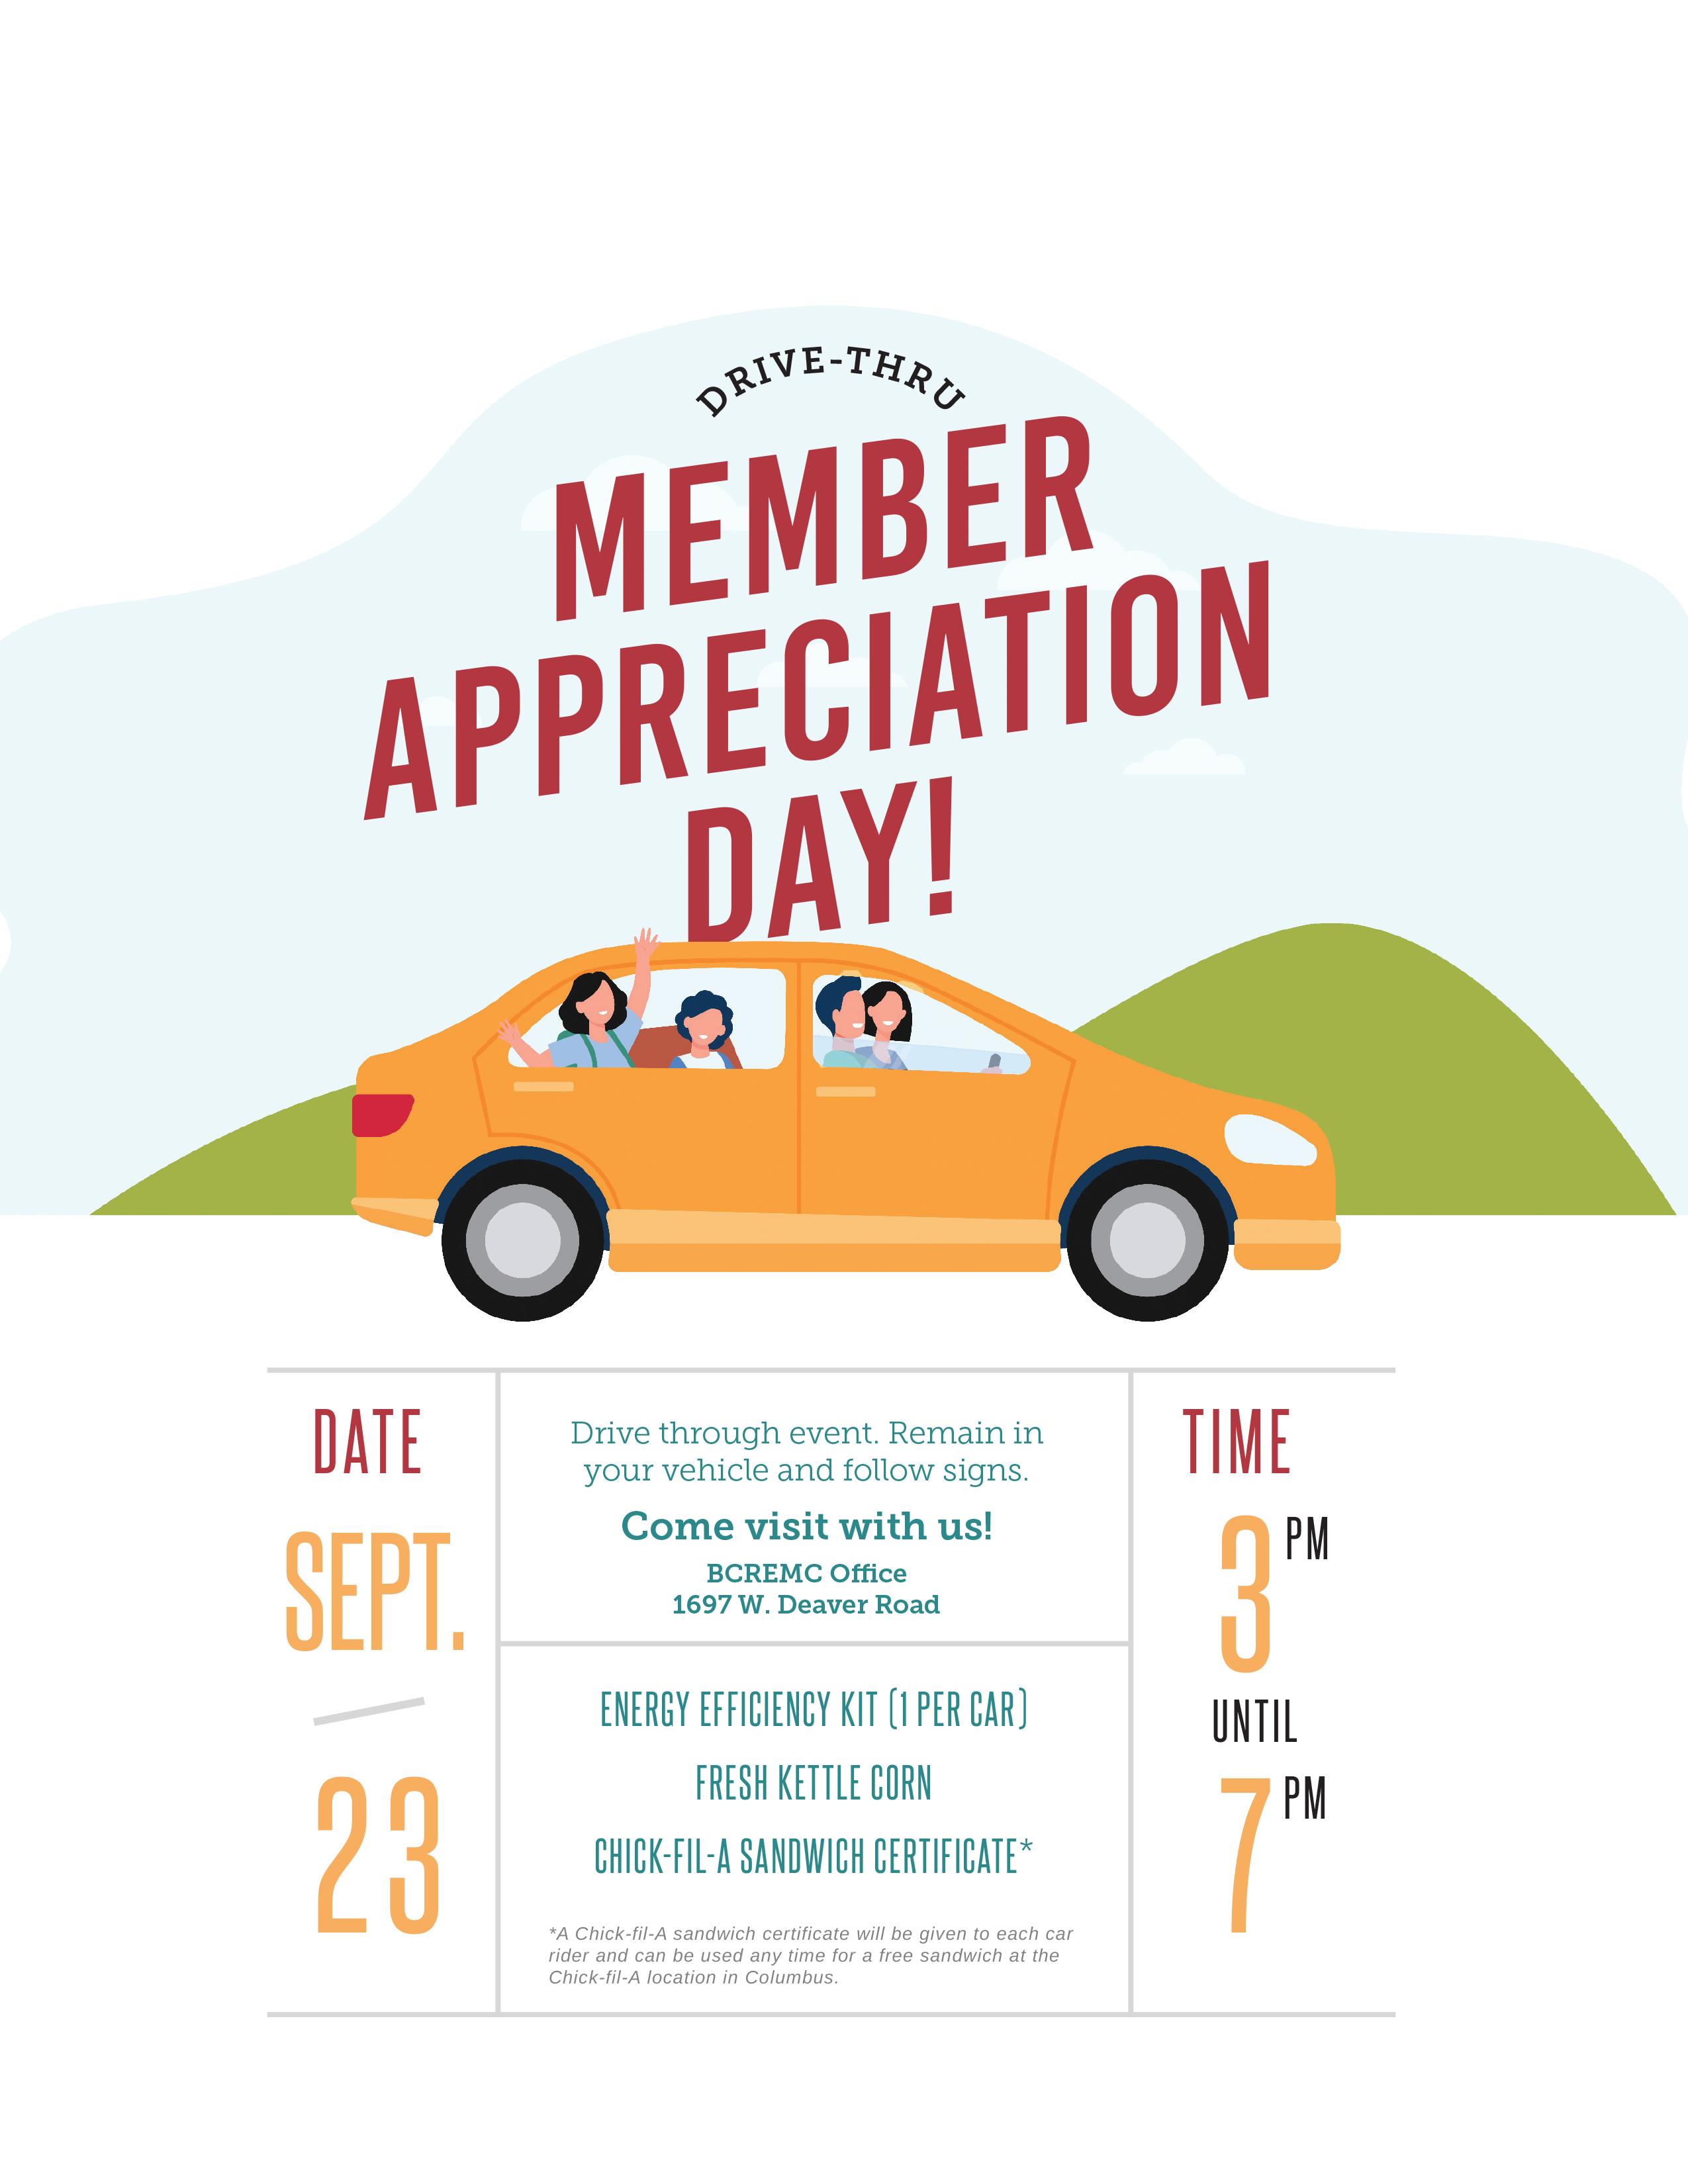 Member Appreciation Day ad